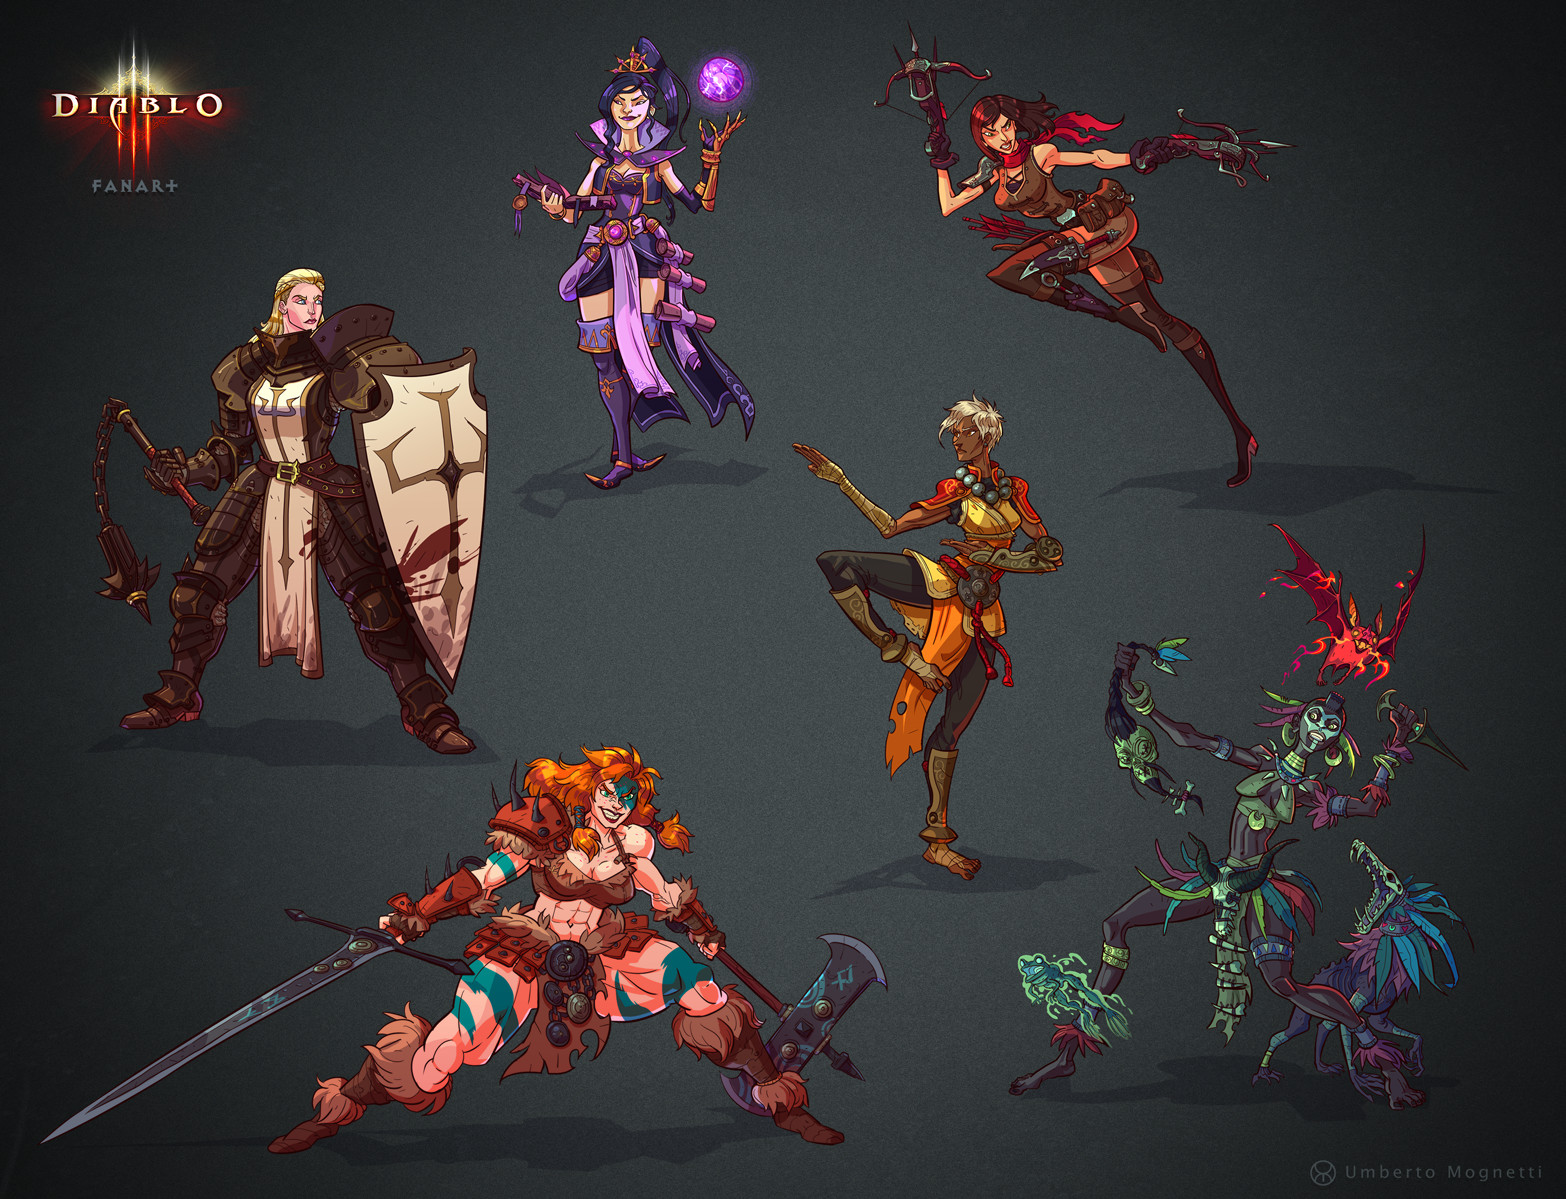 ArtStation - Diablo 3 female classes Fanart, Umberto Mognetti